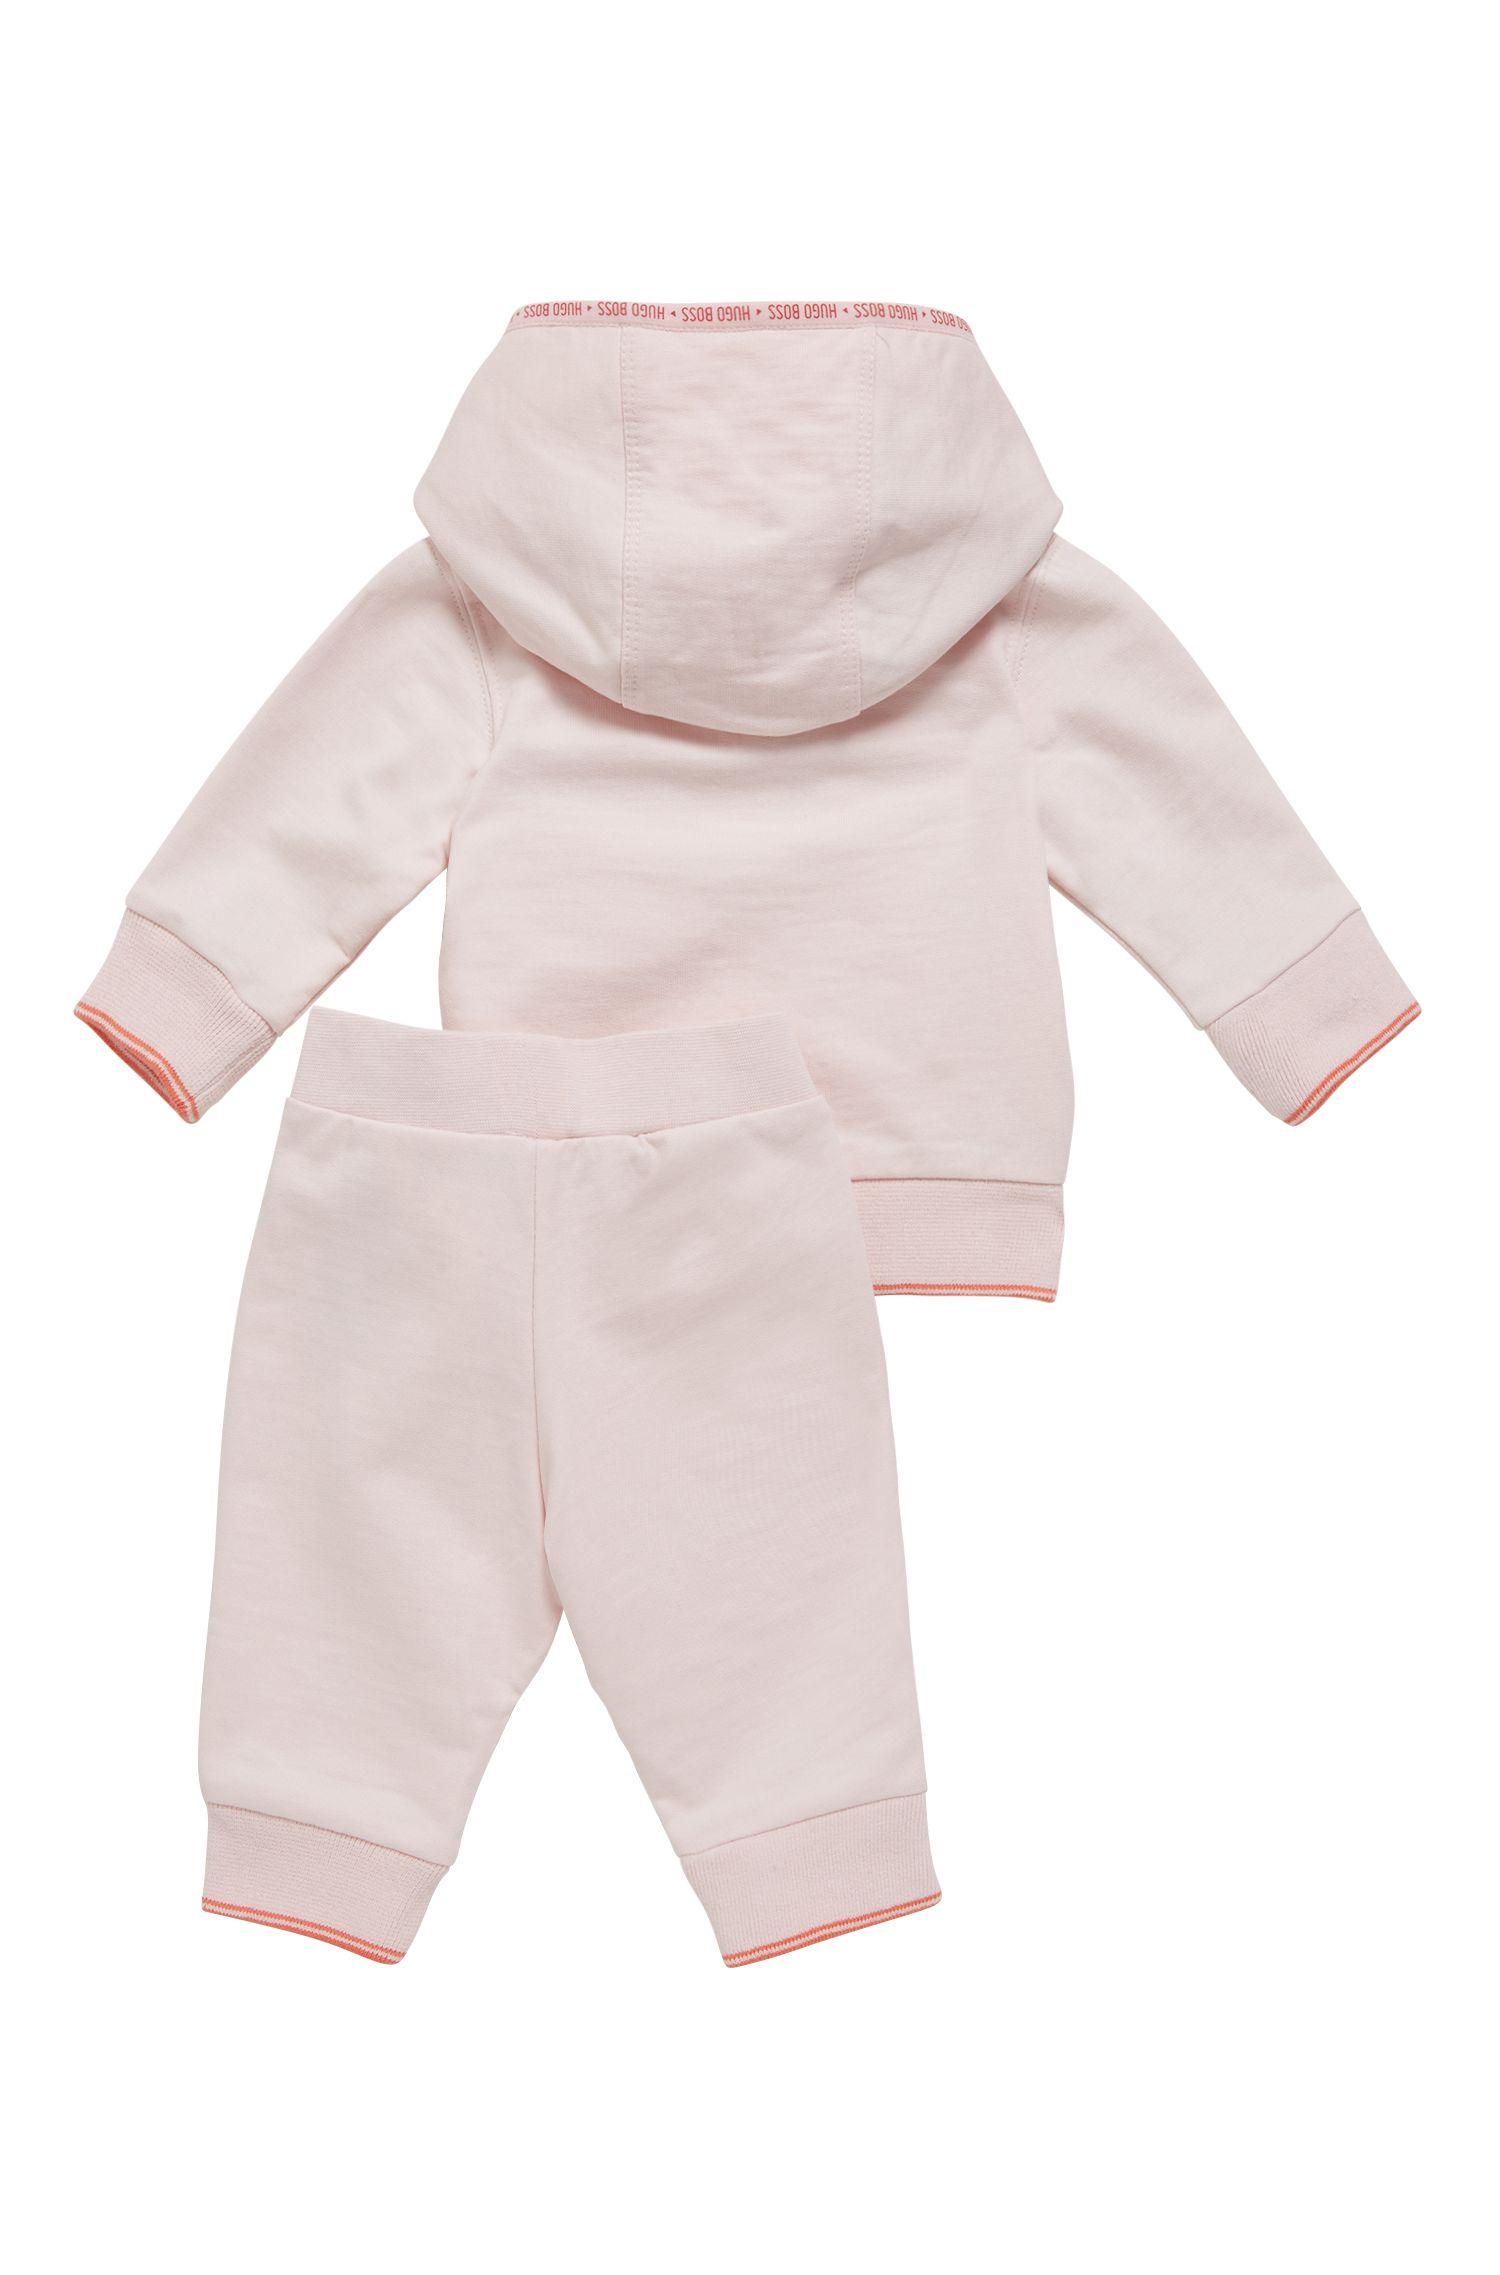 Hugo Boss - Baby-Jogginganzug aus Baumwolle - 2